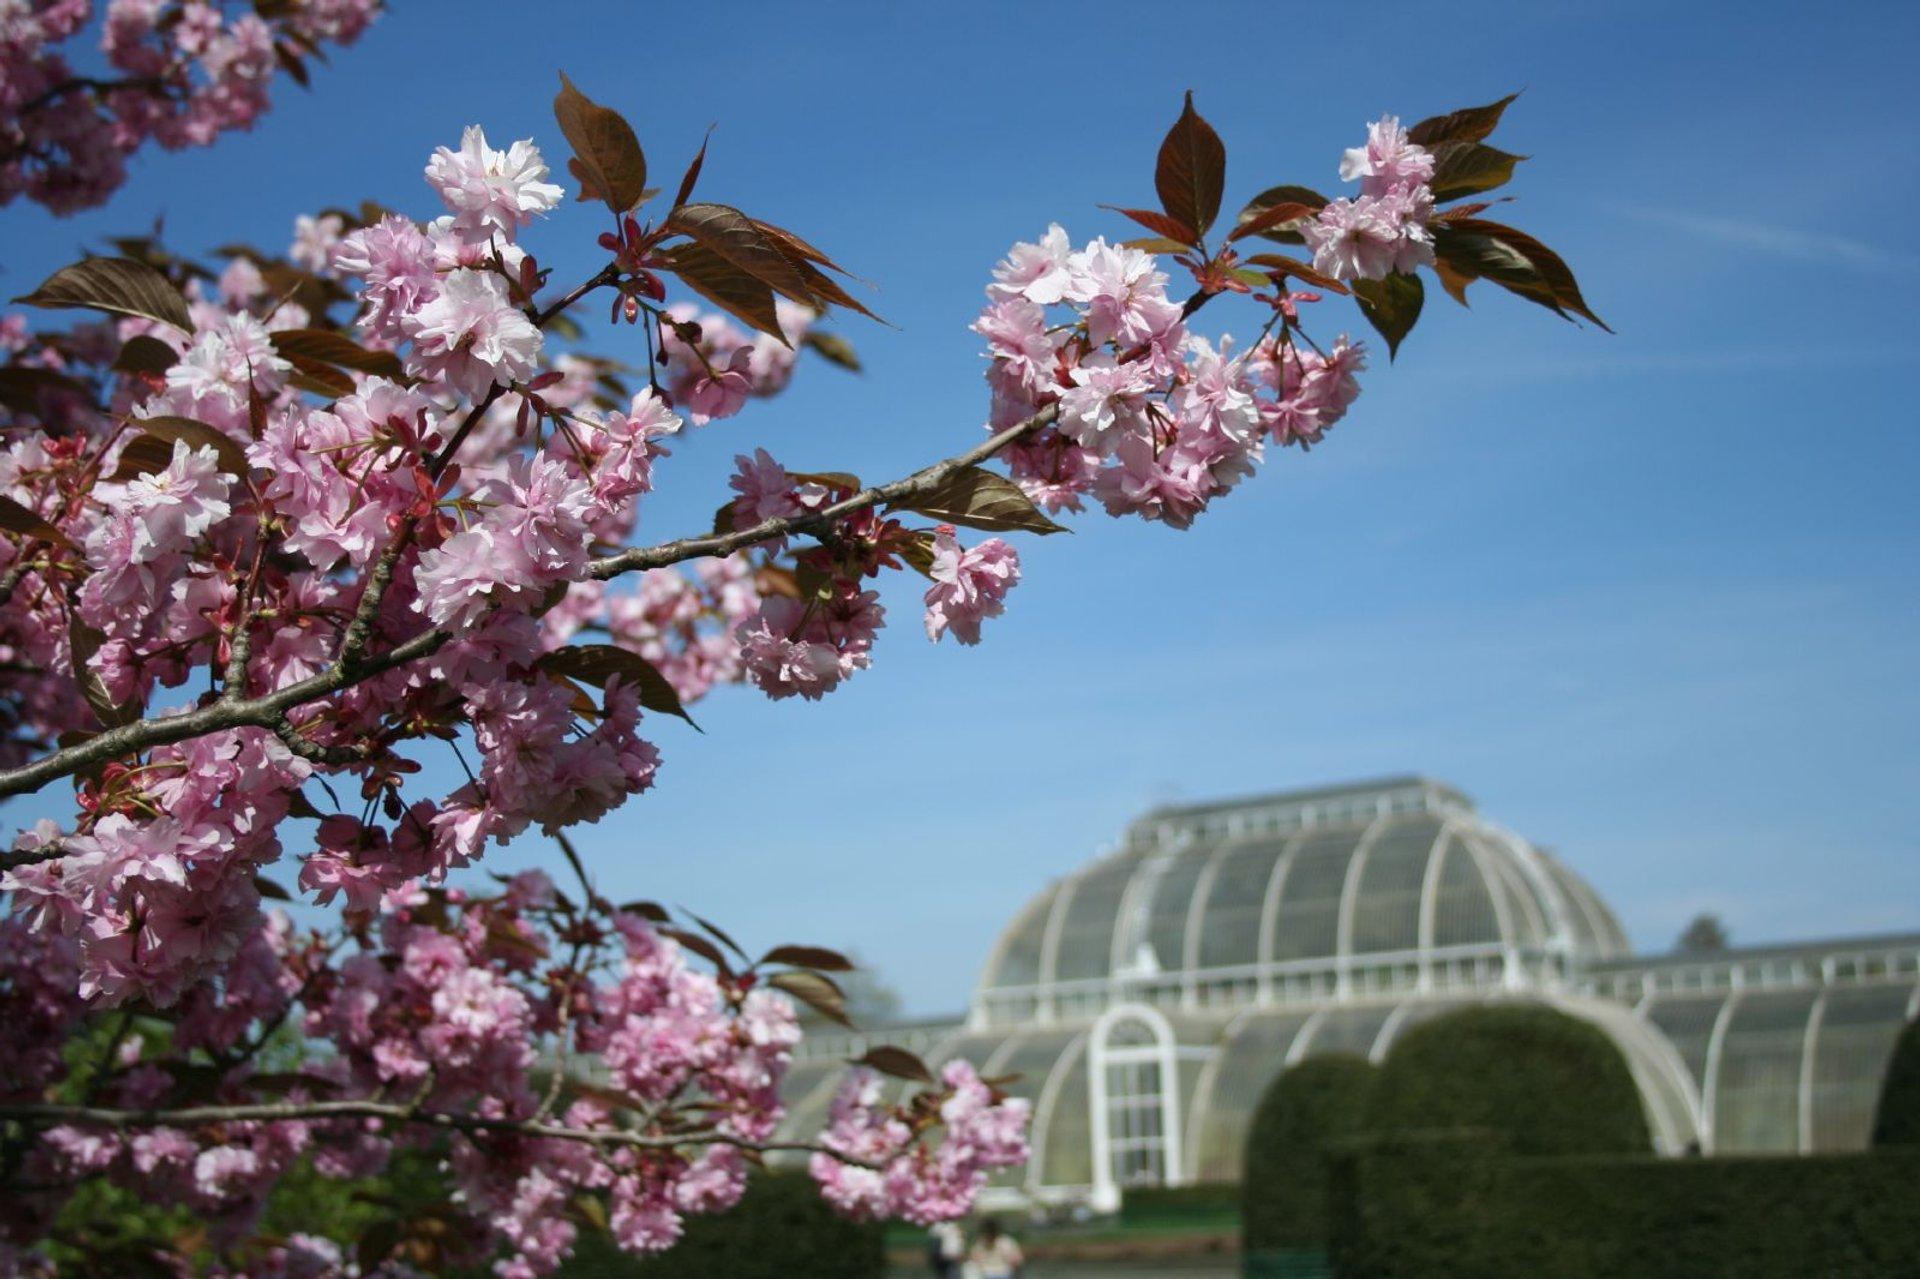 Cherry blossom at Kew Gardens 2019